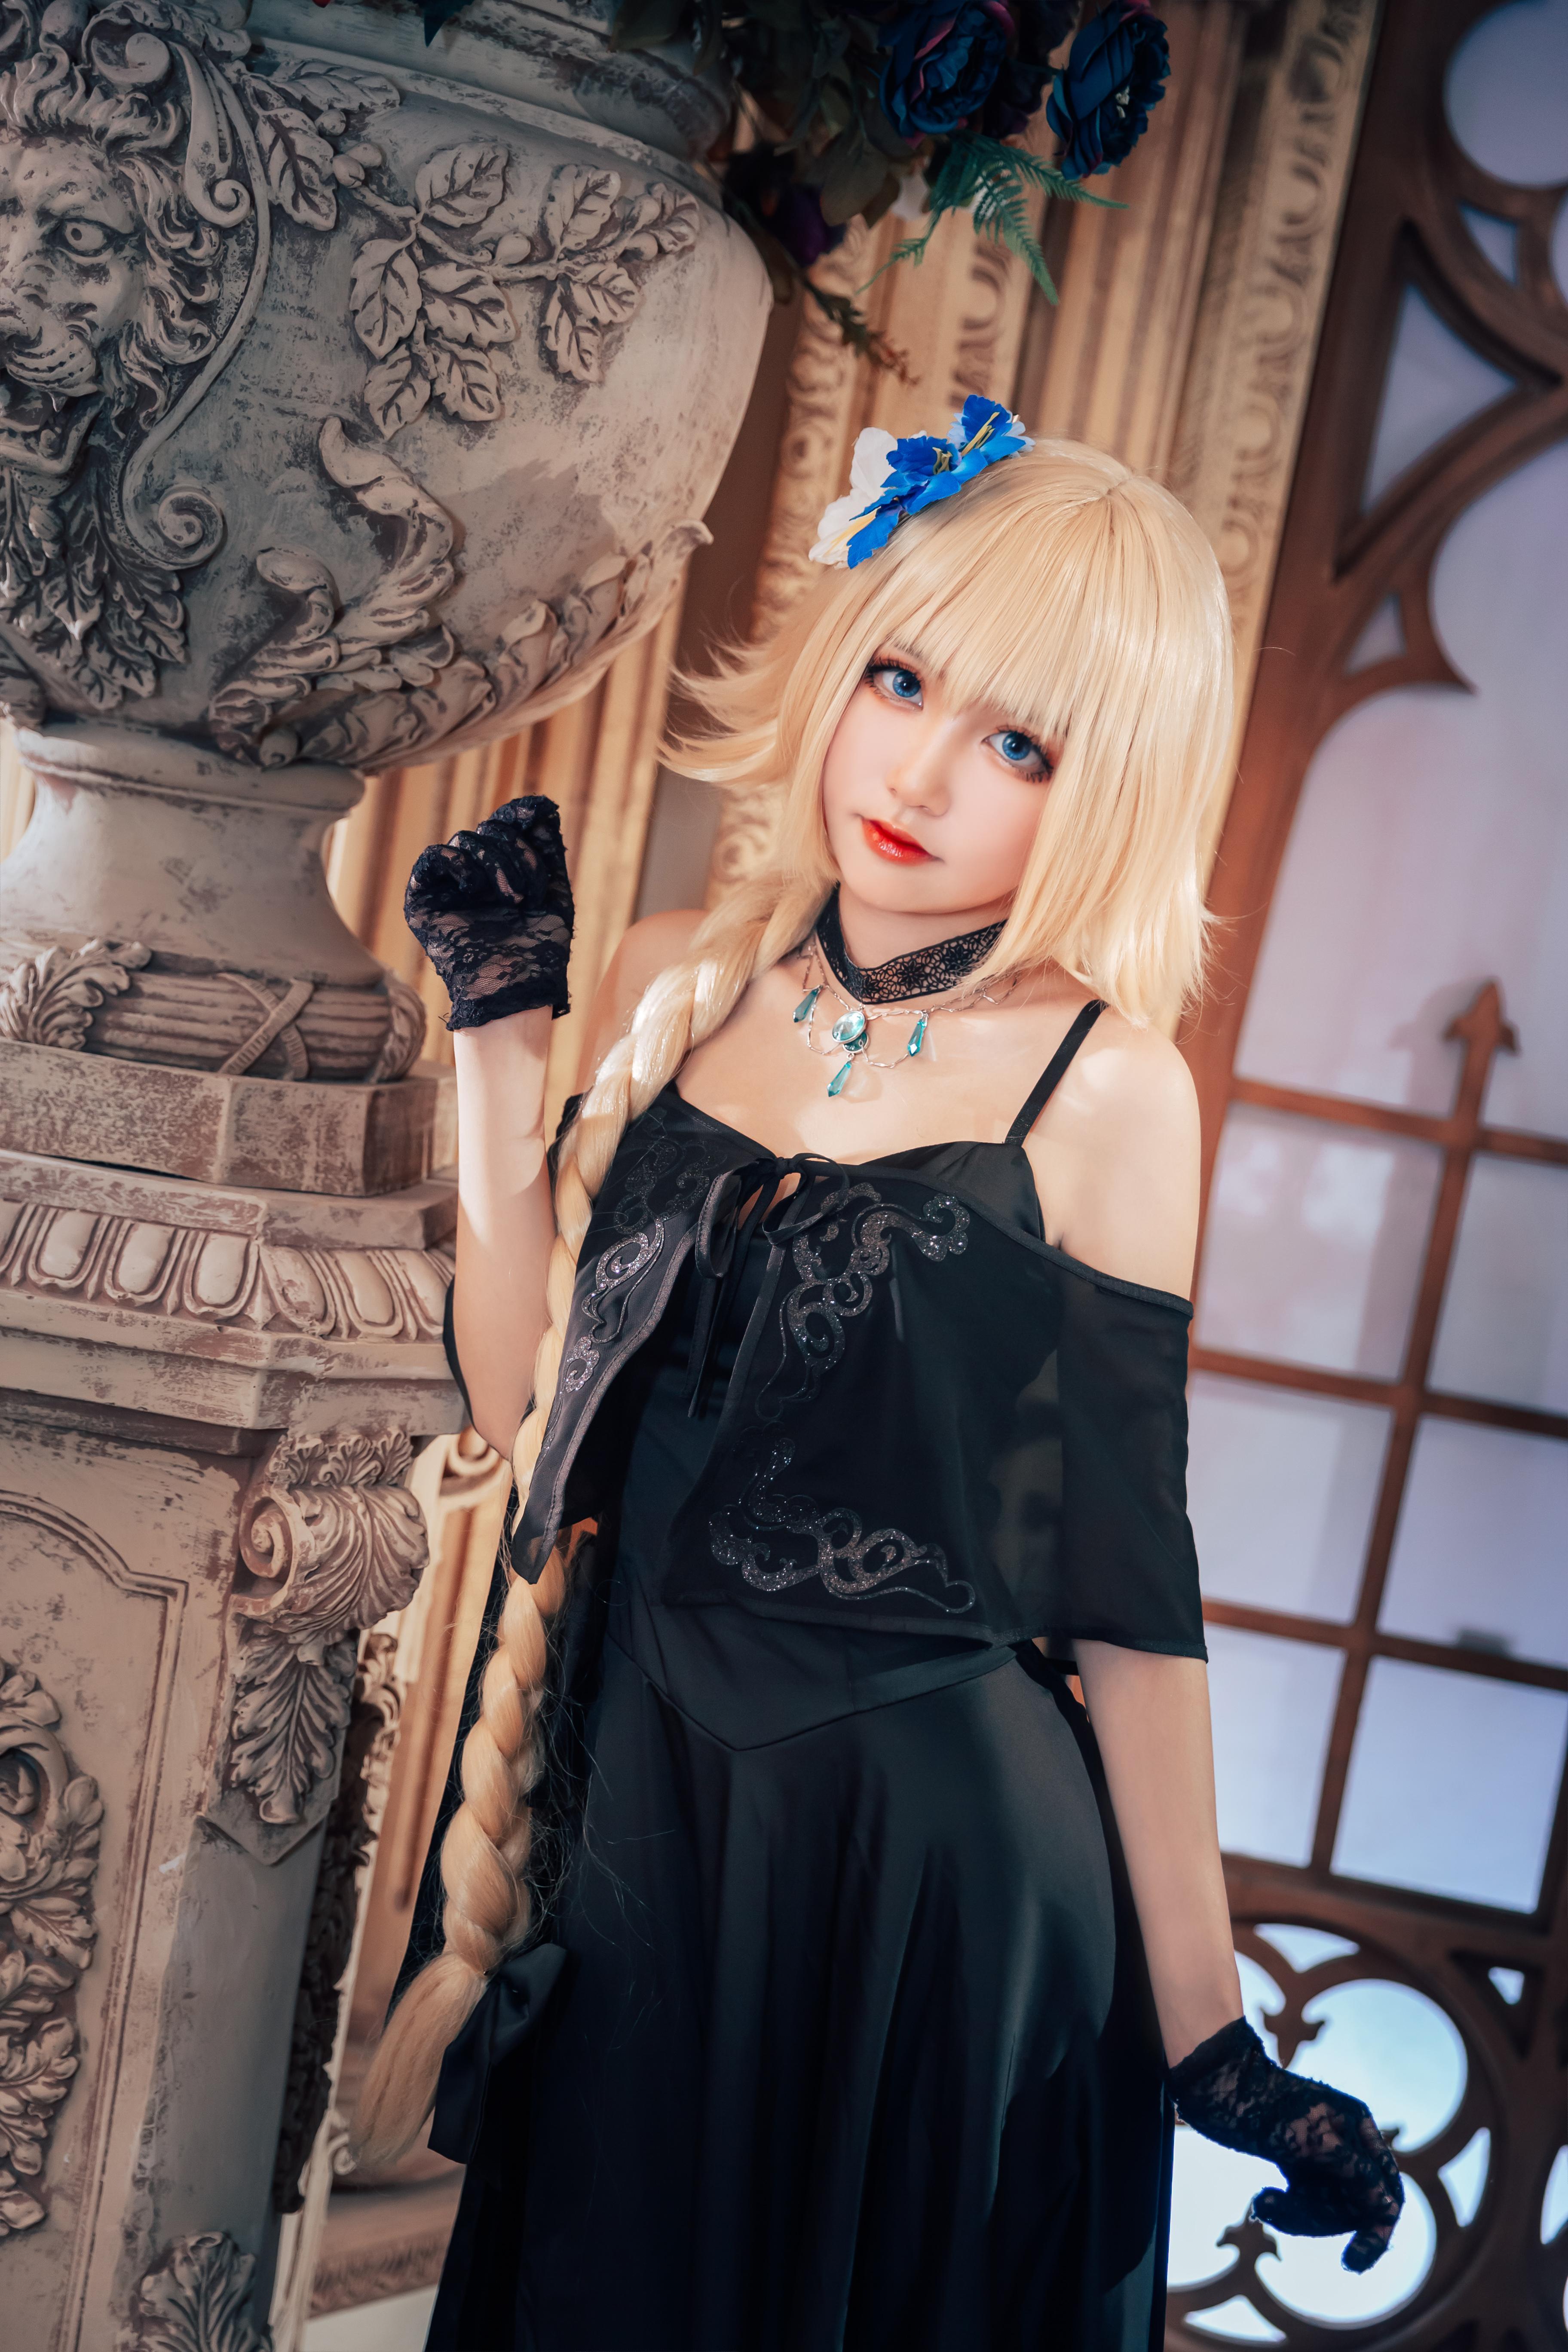 《FATE/GRAND ORDER》正片cosplay【CN:泡泡_Julia】-第1张